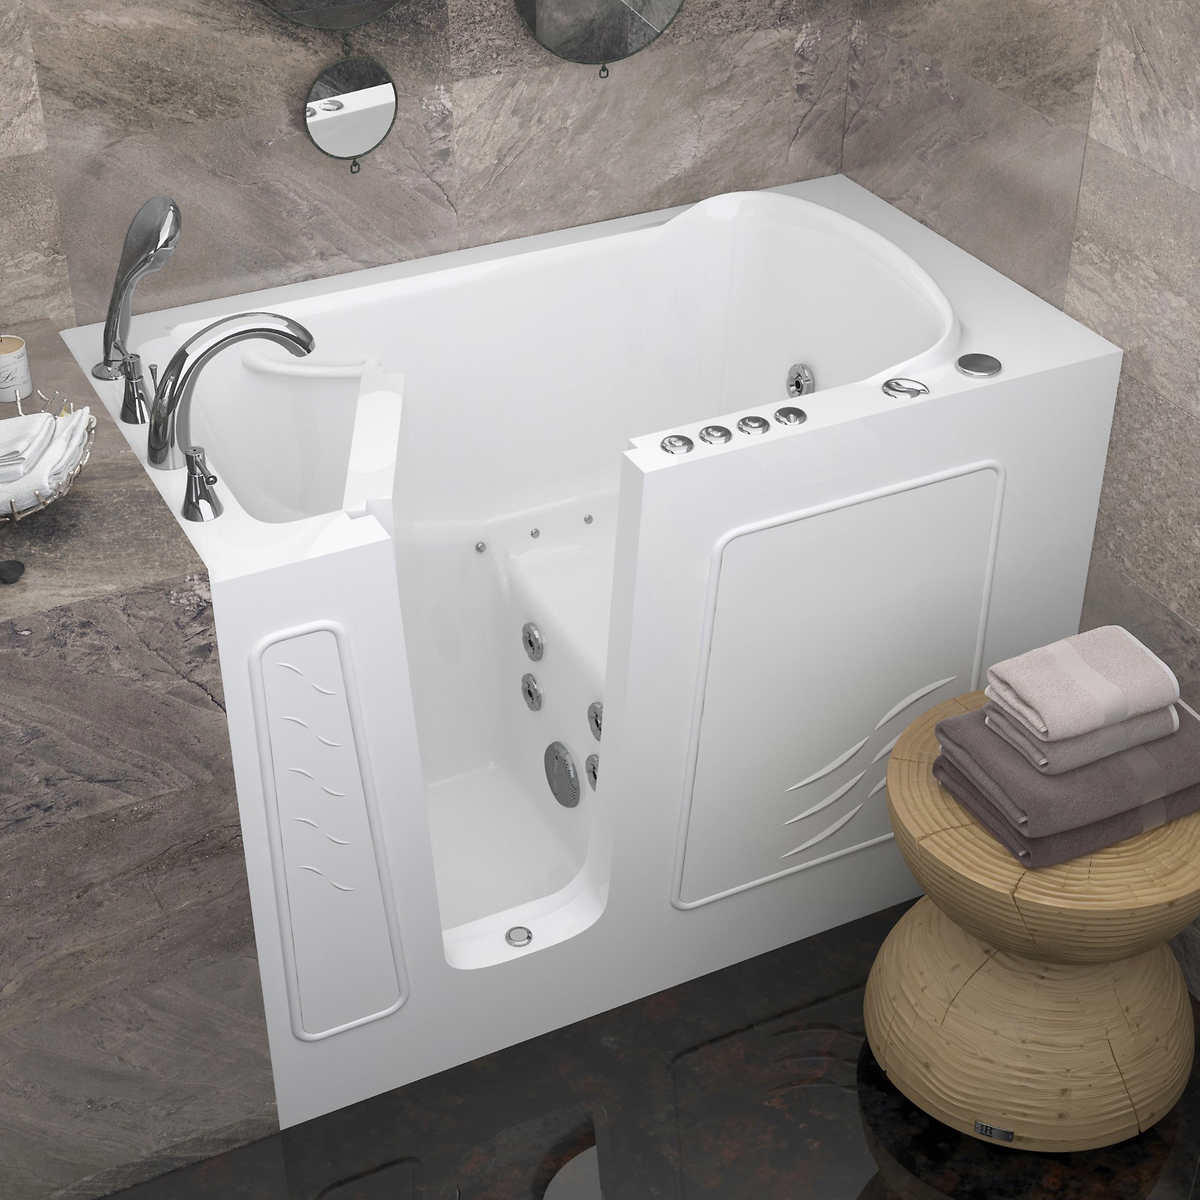 Bathroom Mirrors Costco access tubs walk-in dual system tub